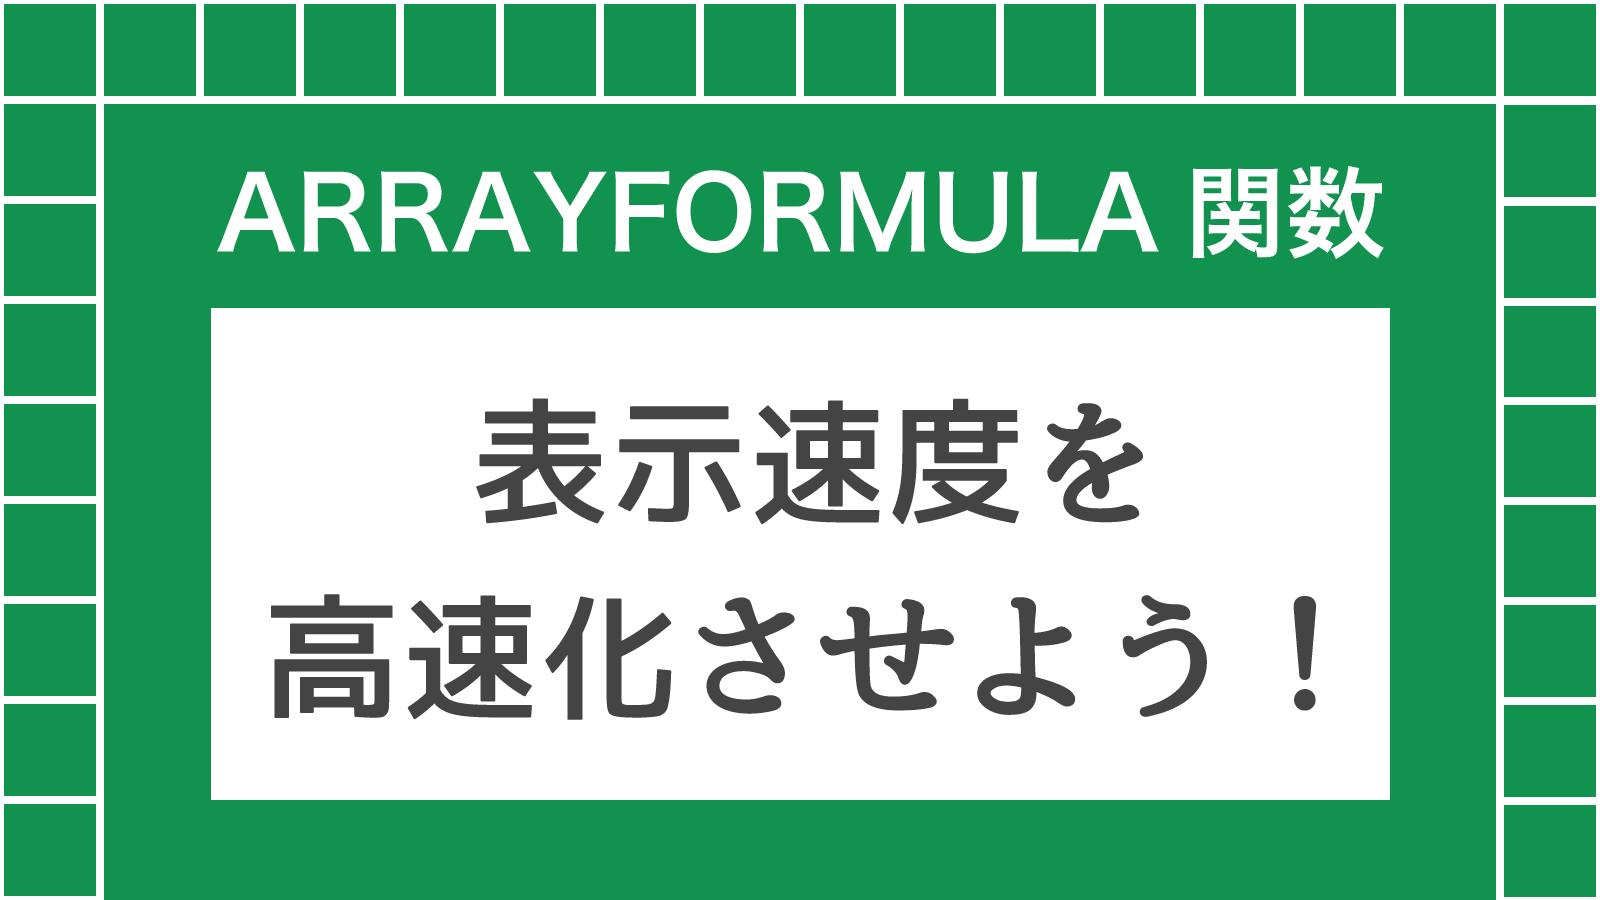 spreadsheets-arrayformula